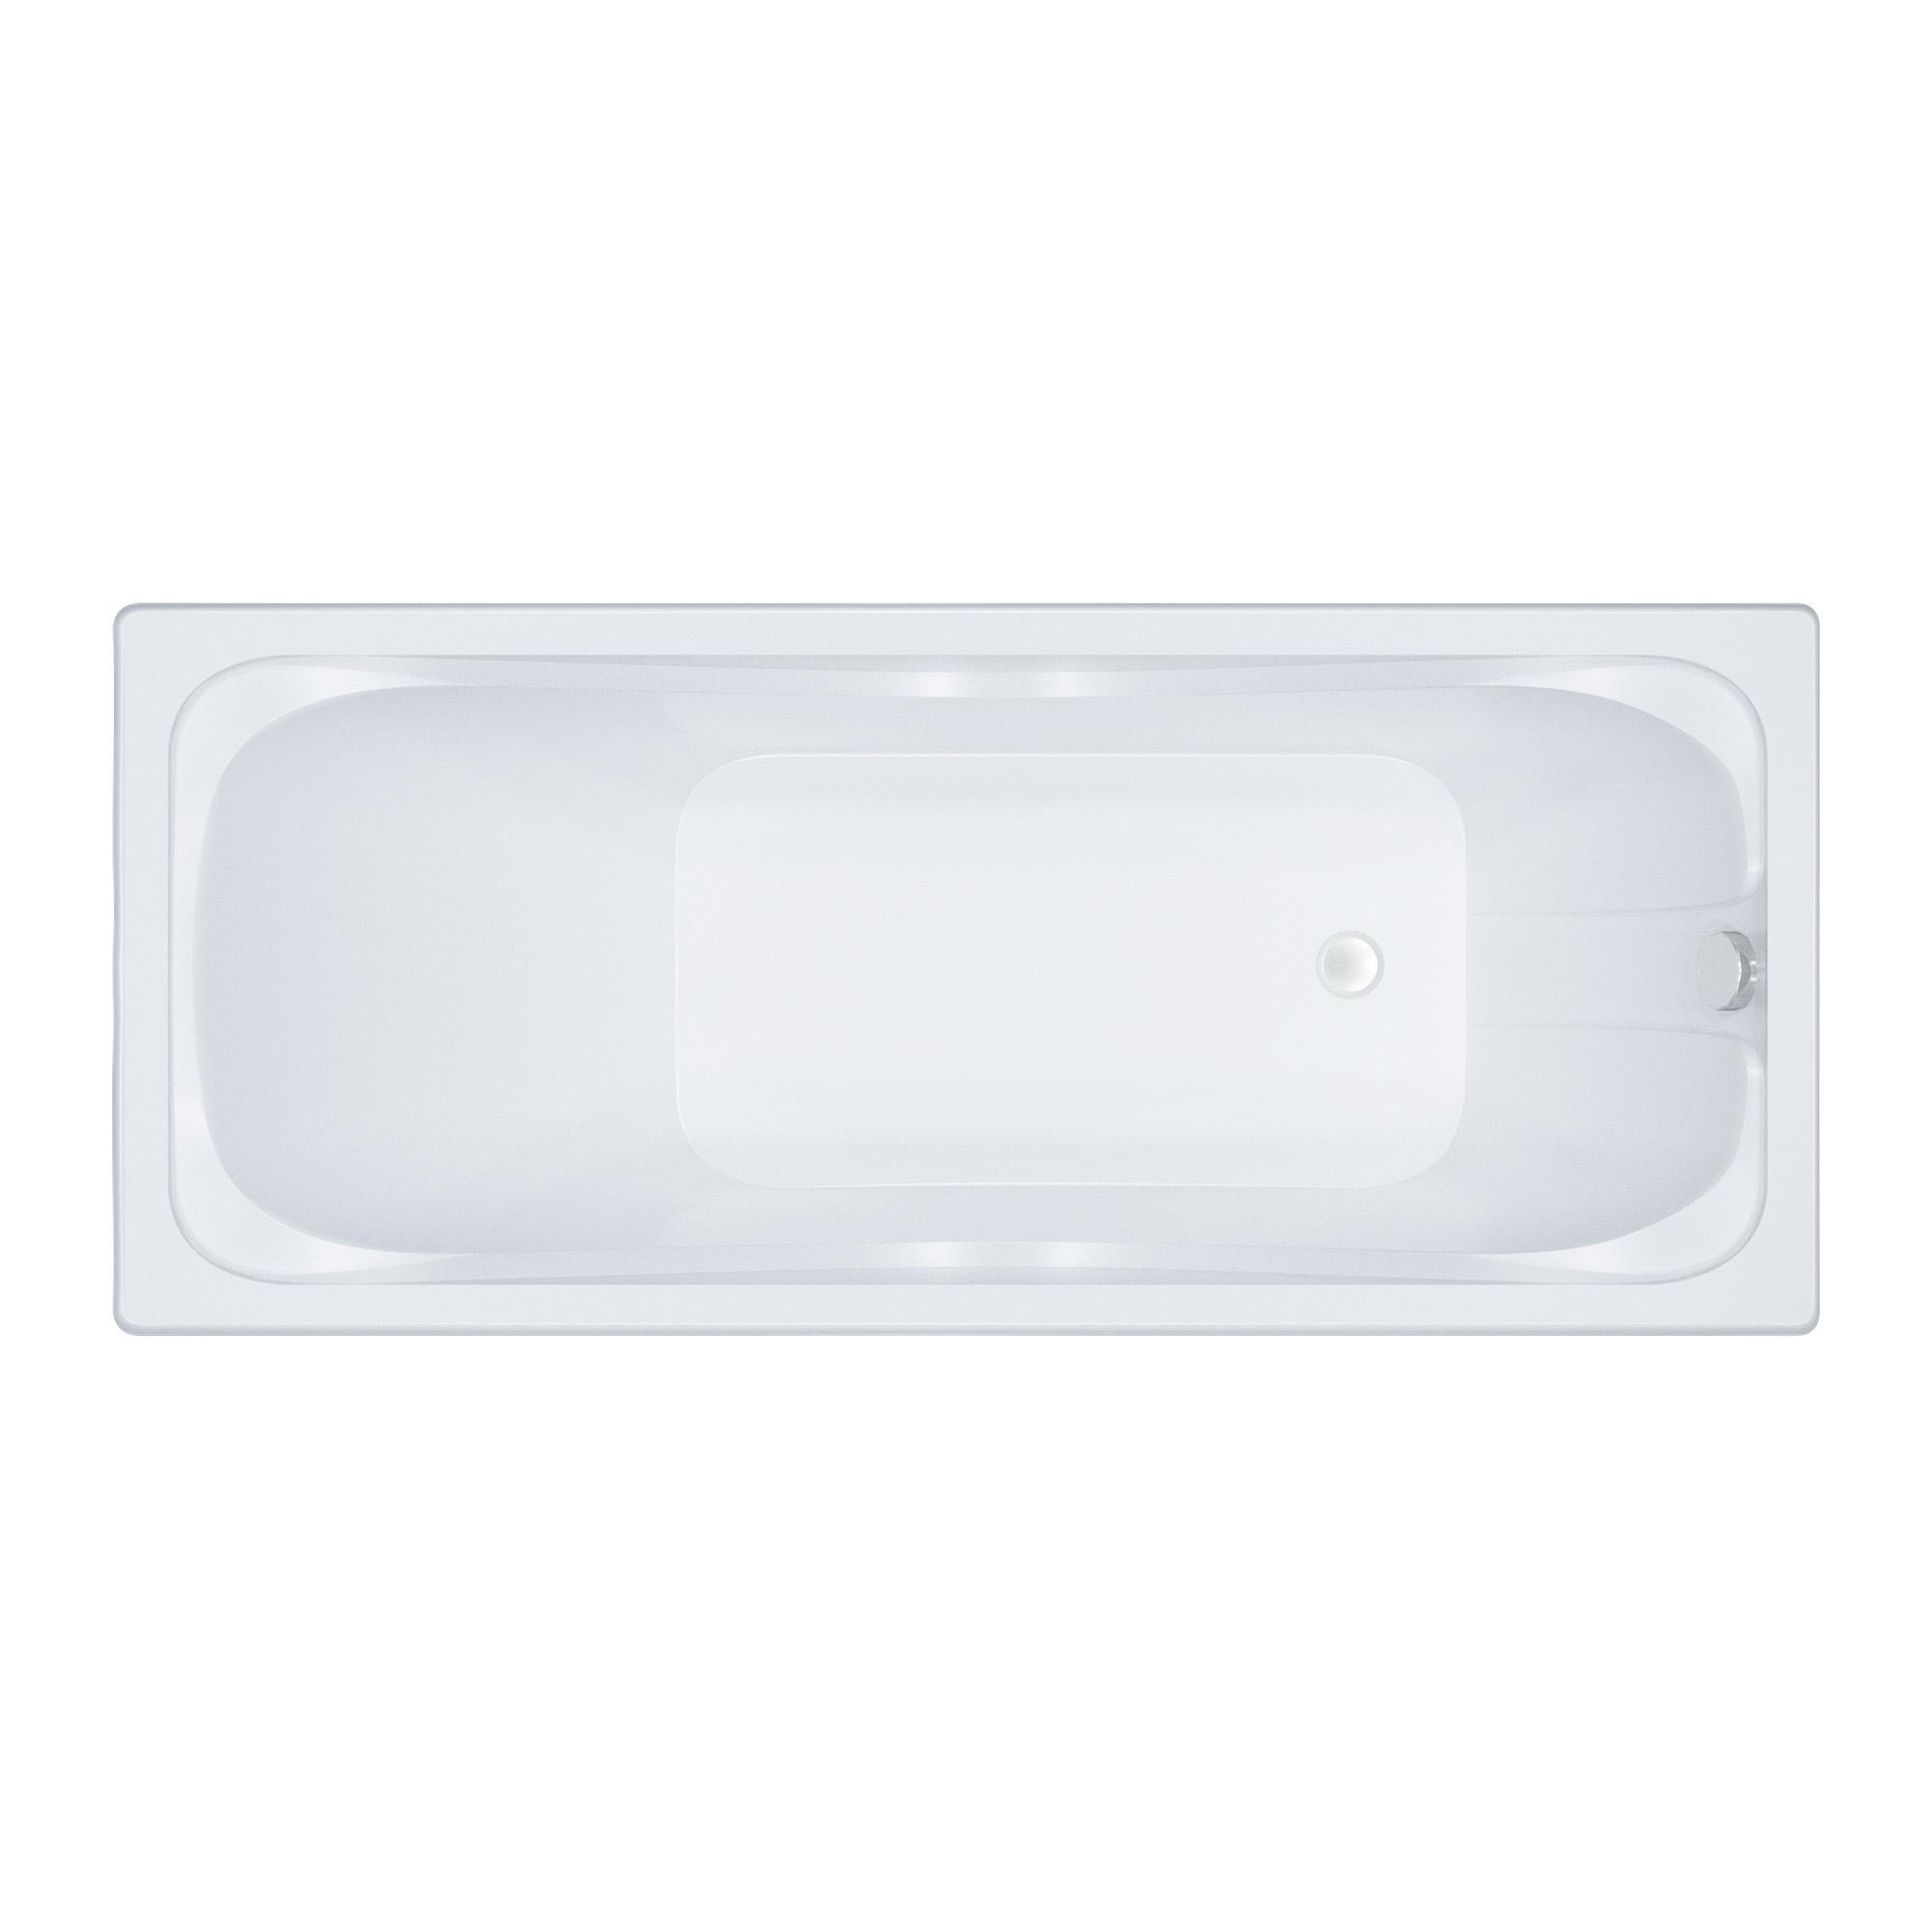 Акриловая ванна Тритон Стандарт 170 экран для ванны triton стандарт 120